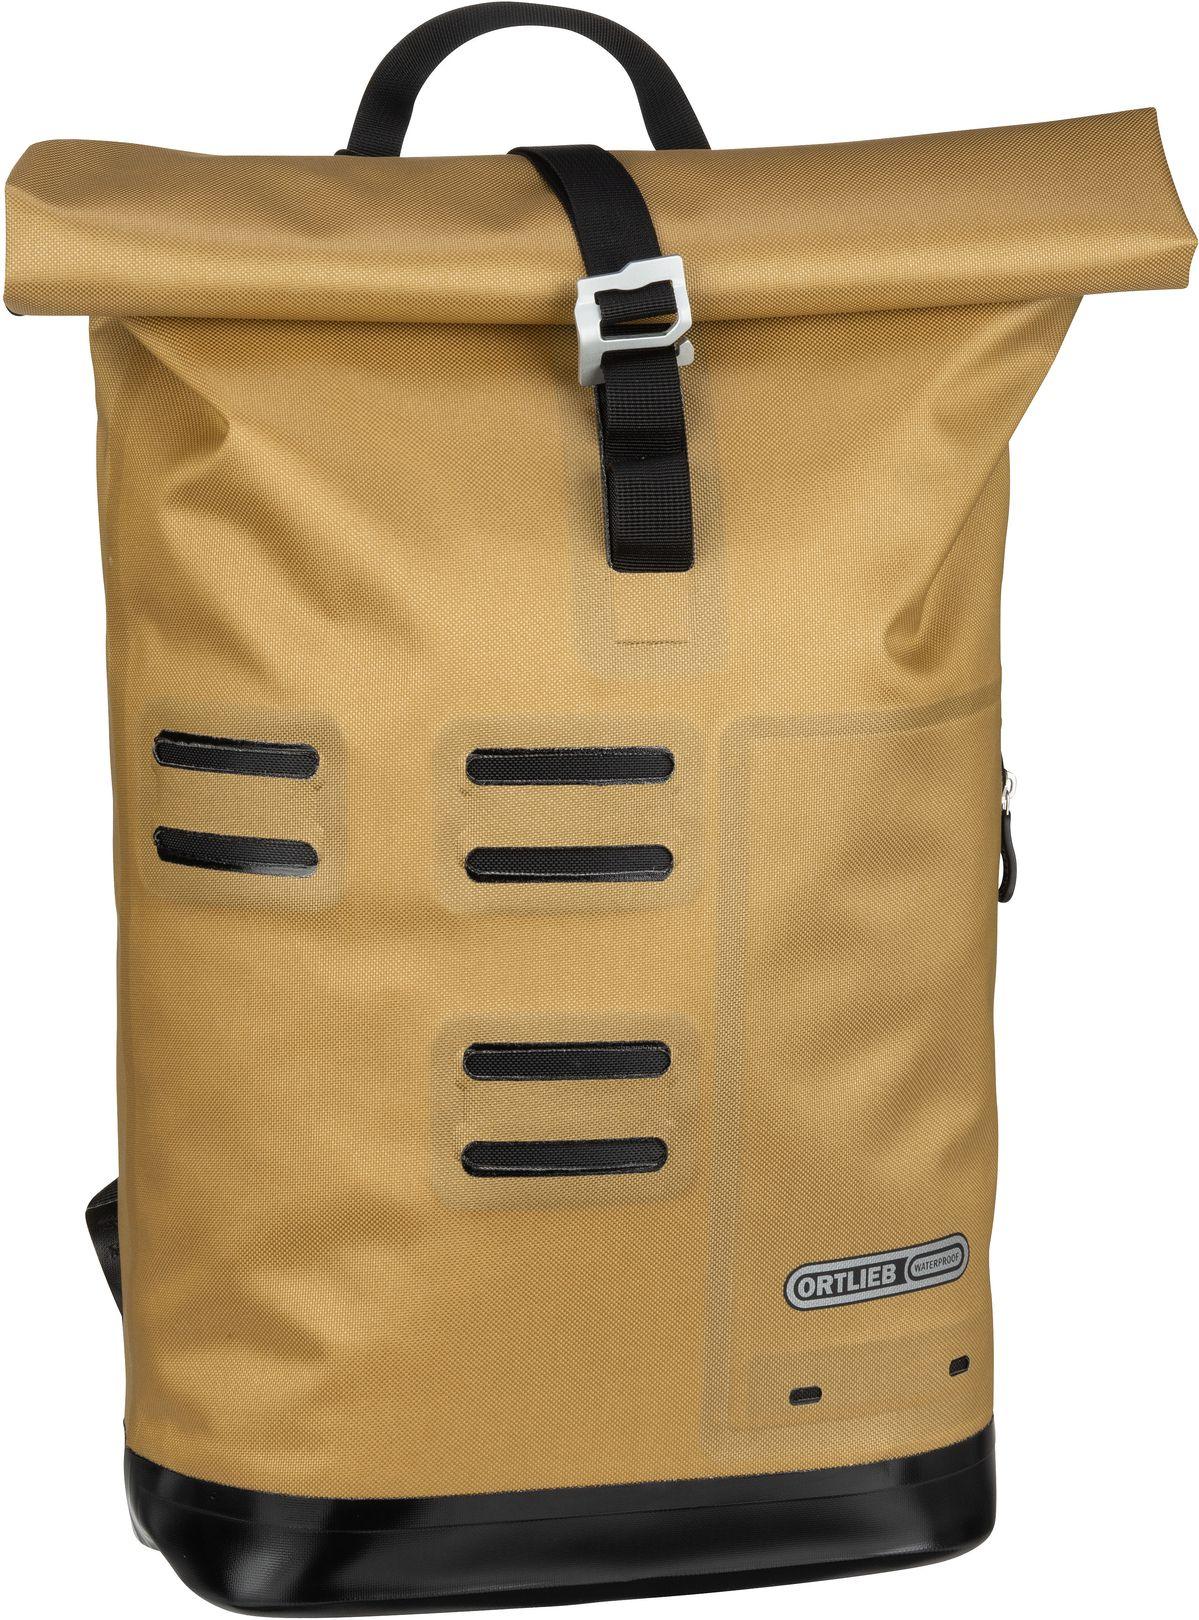 Rucksack / Daypack Commuter-Daypack City Mustard (21 Liter)